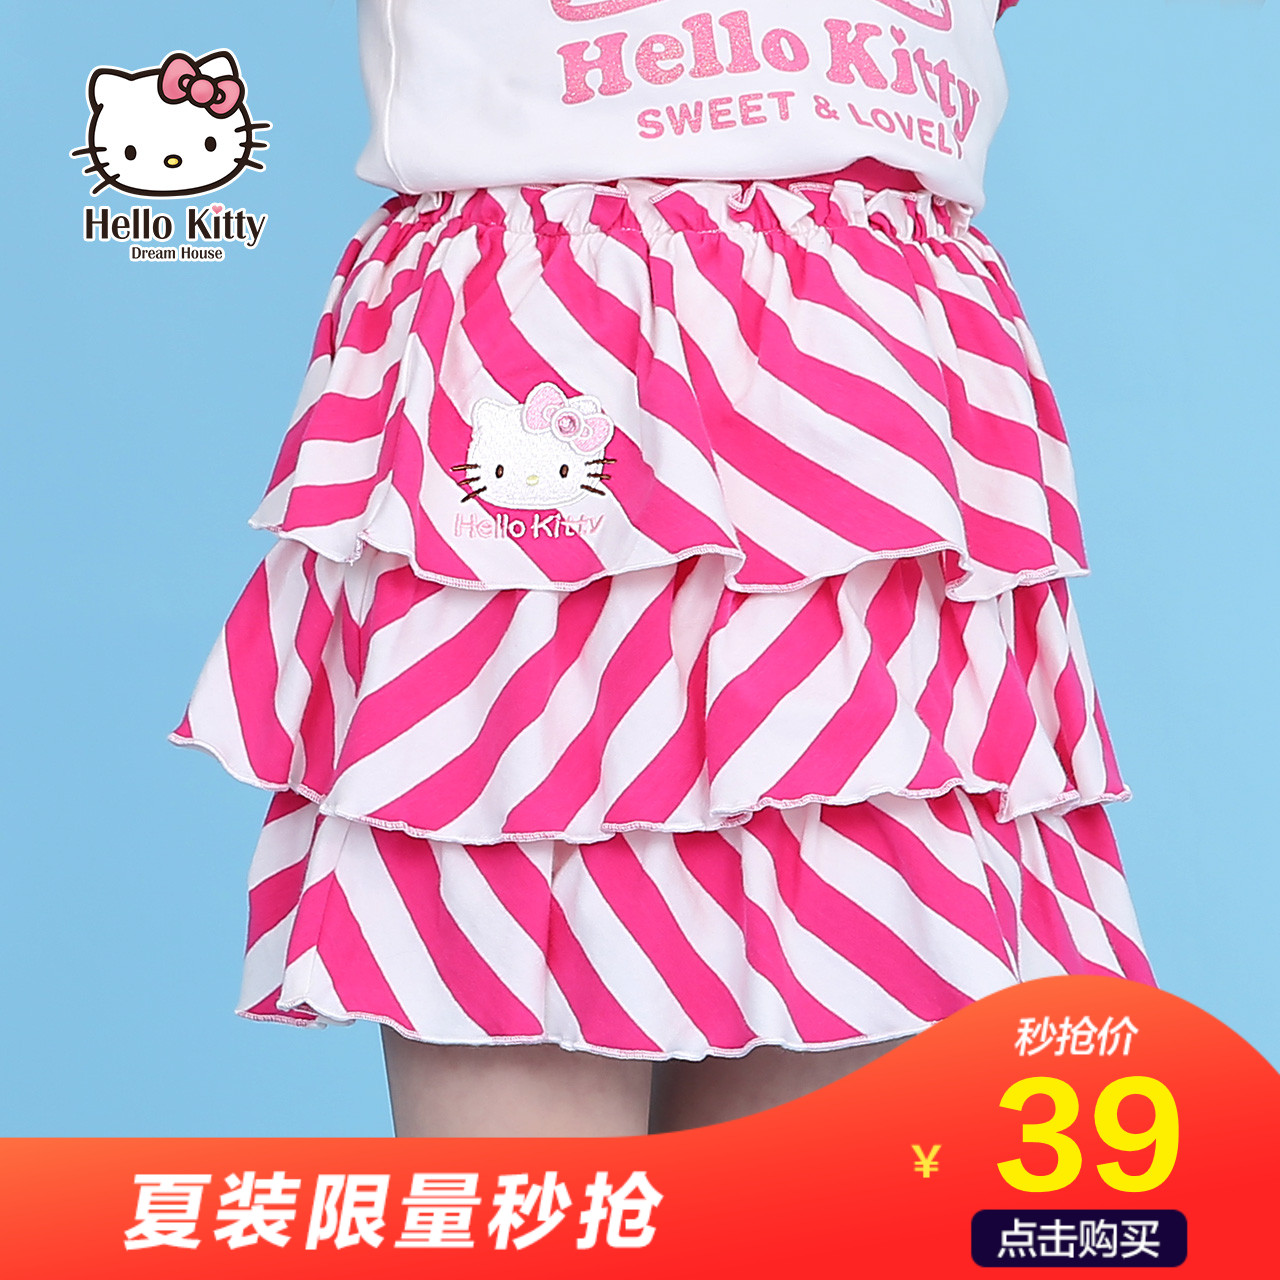 Hellokitty童装 2018新款夏装中大女童蓬蓬裙休闲半身裙蛋糕短裙